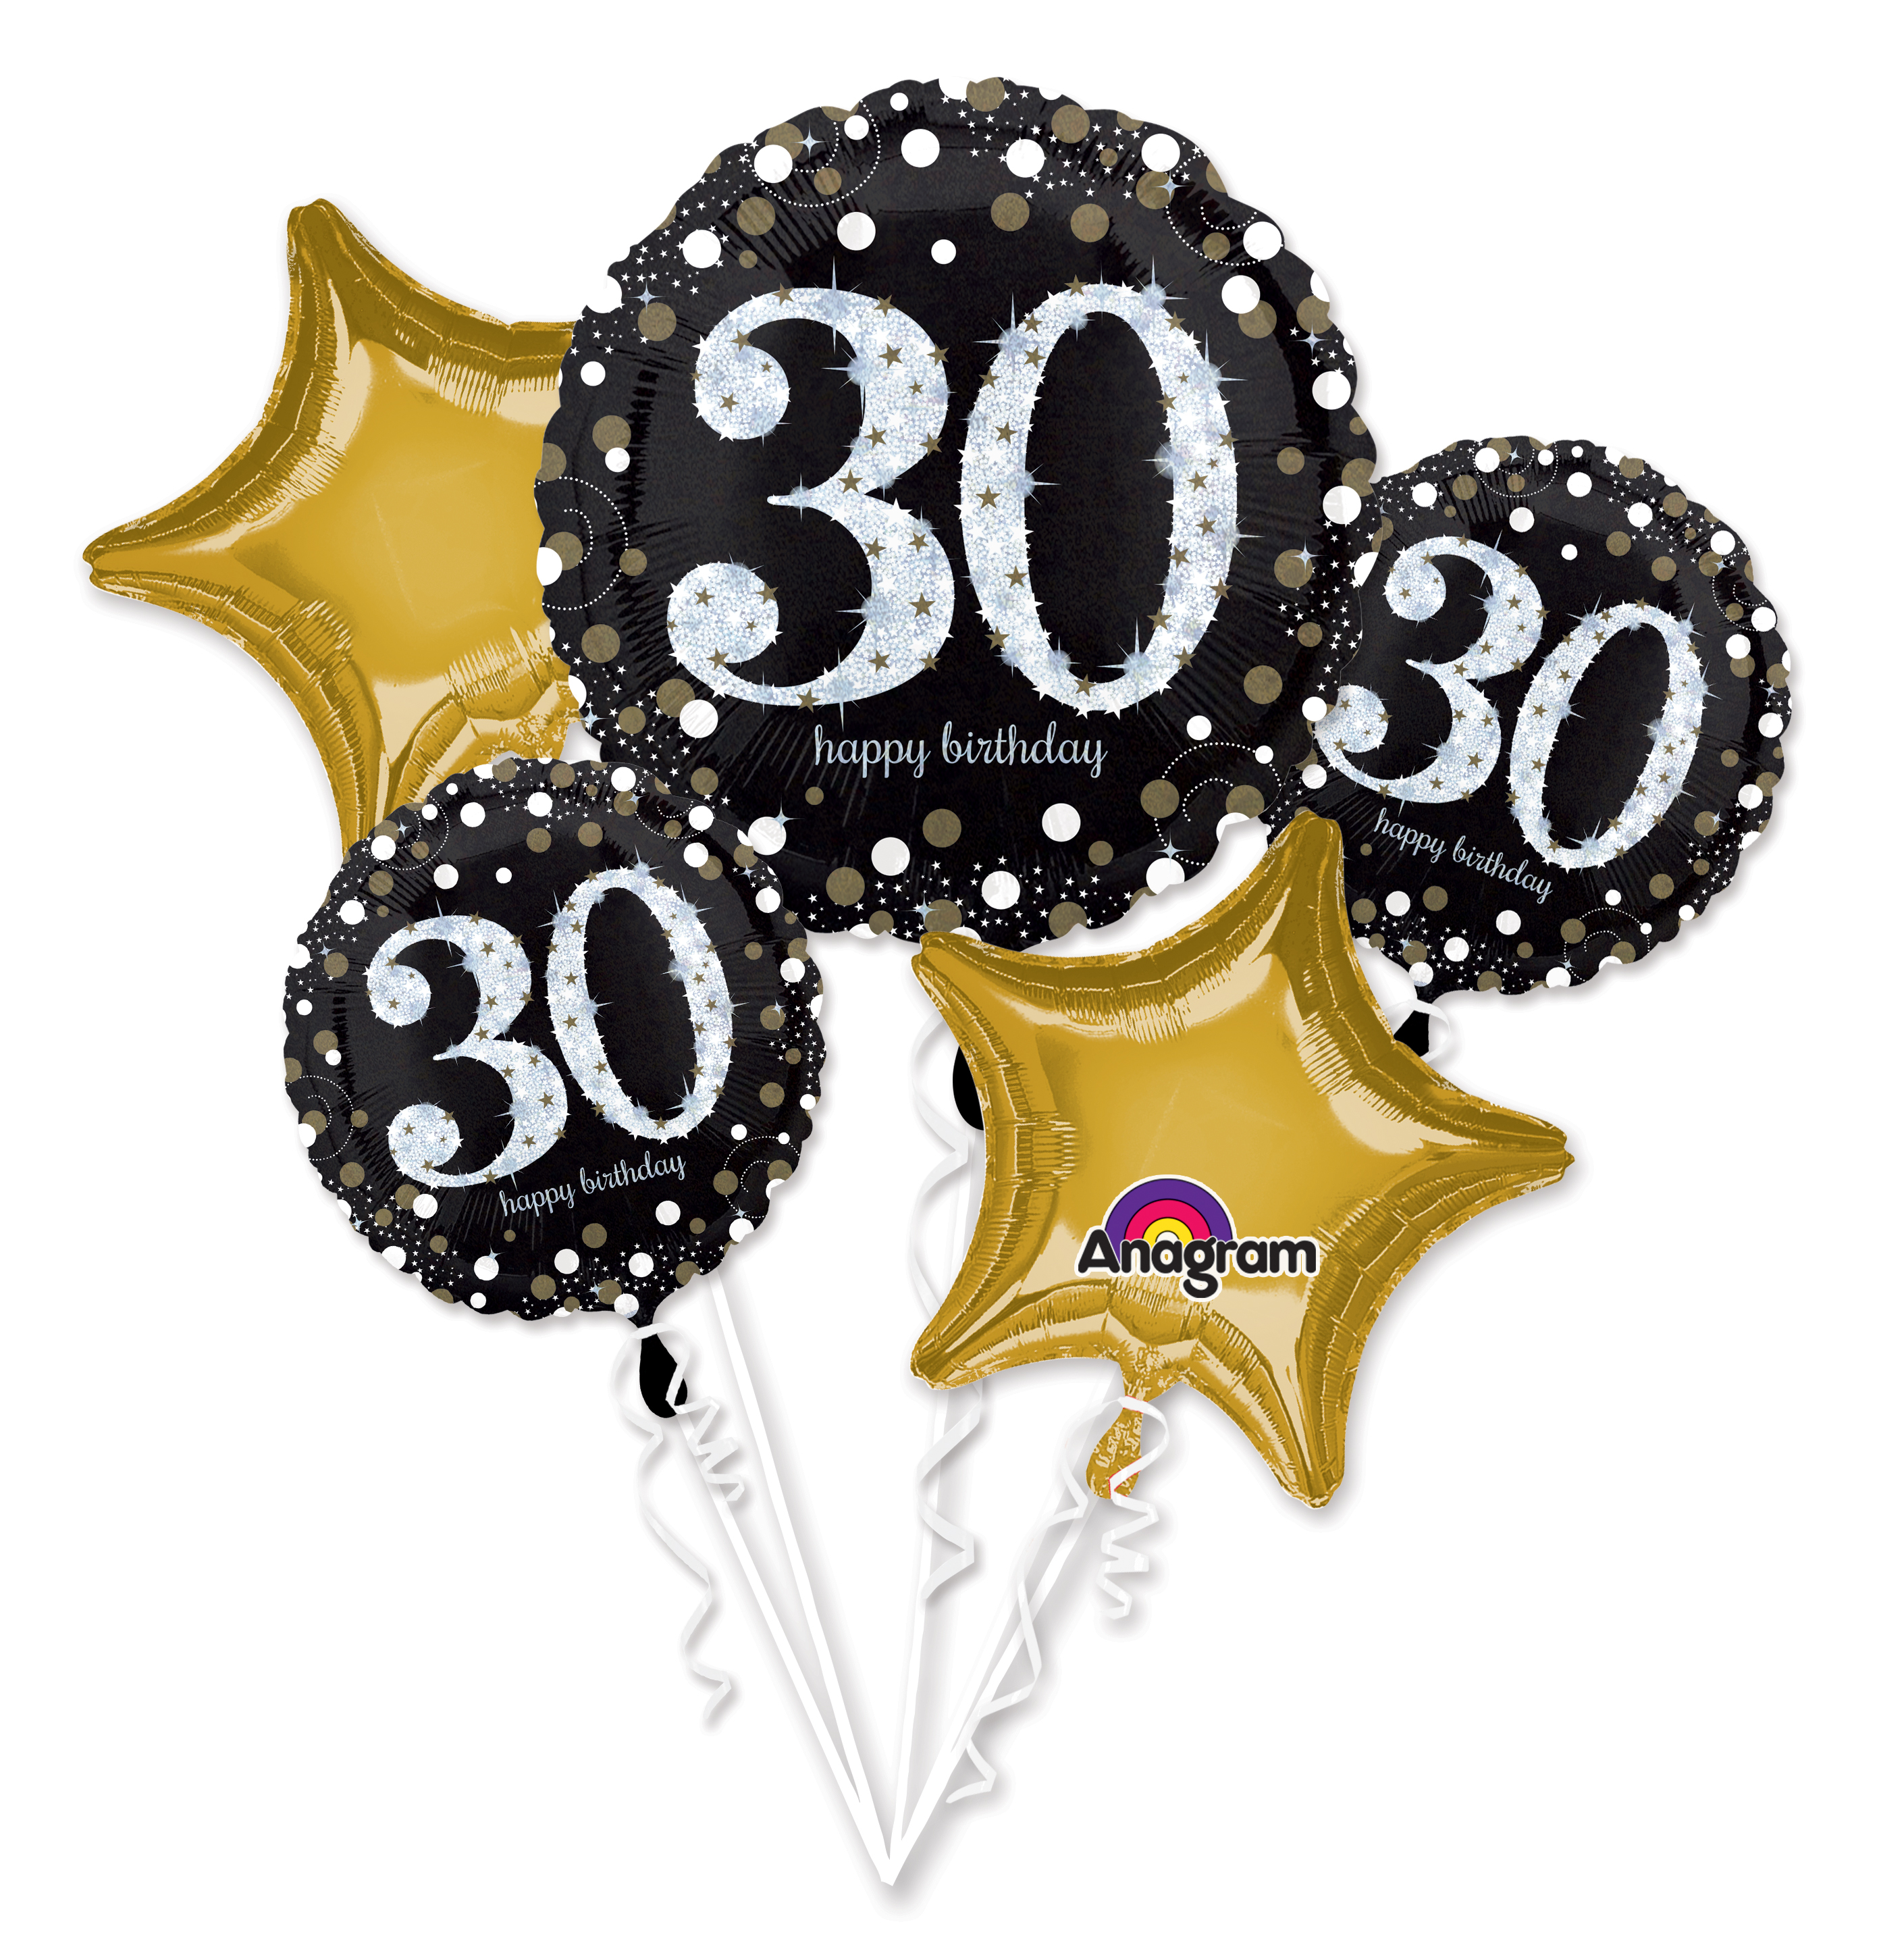 Bouquet Sparkling Birthday 30 Balloon Packaged